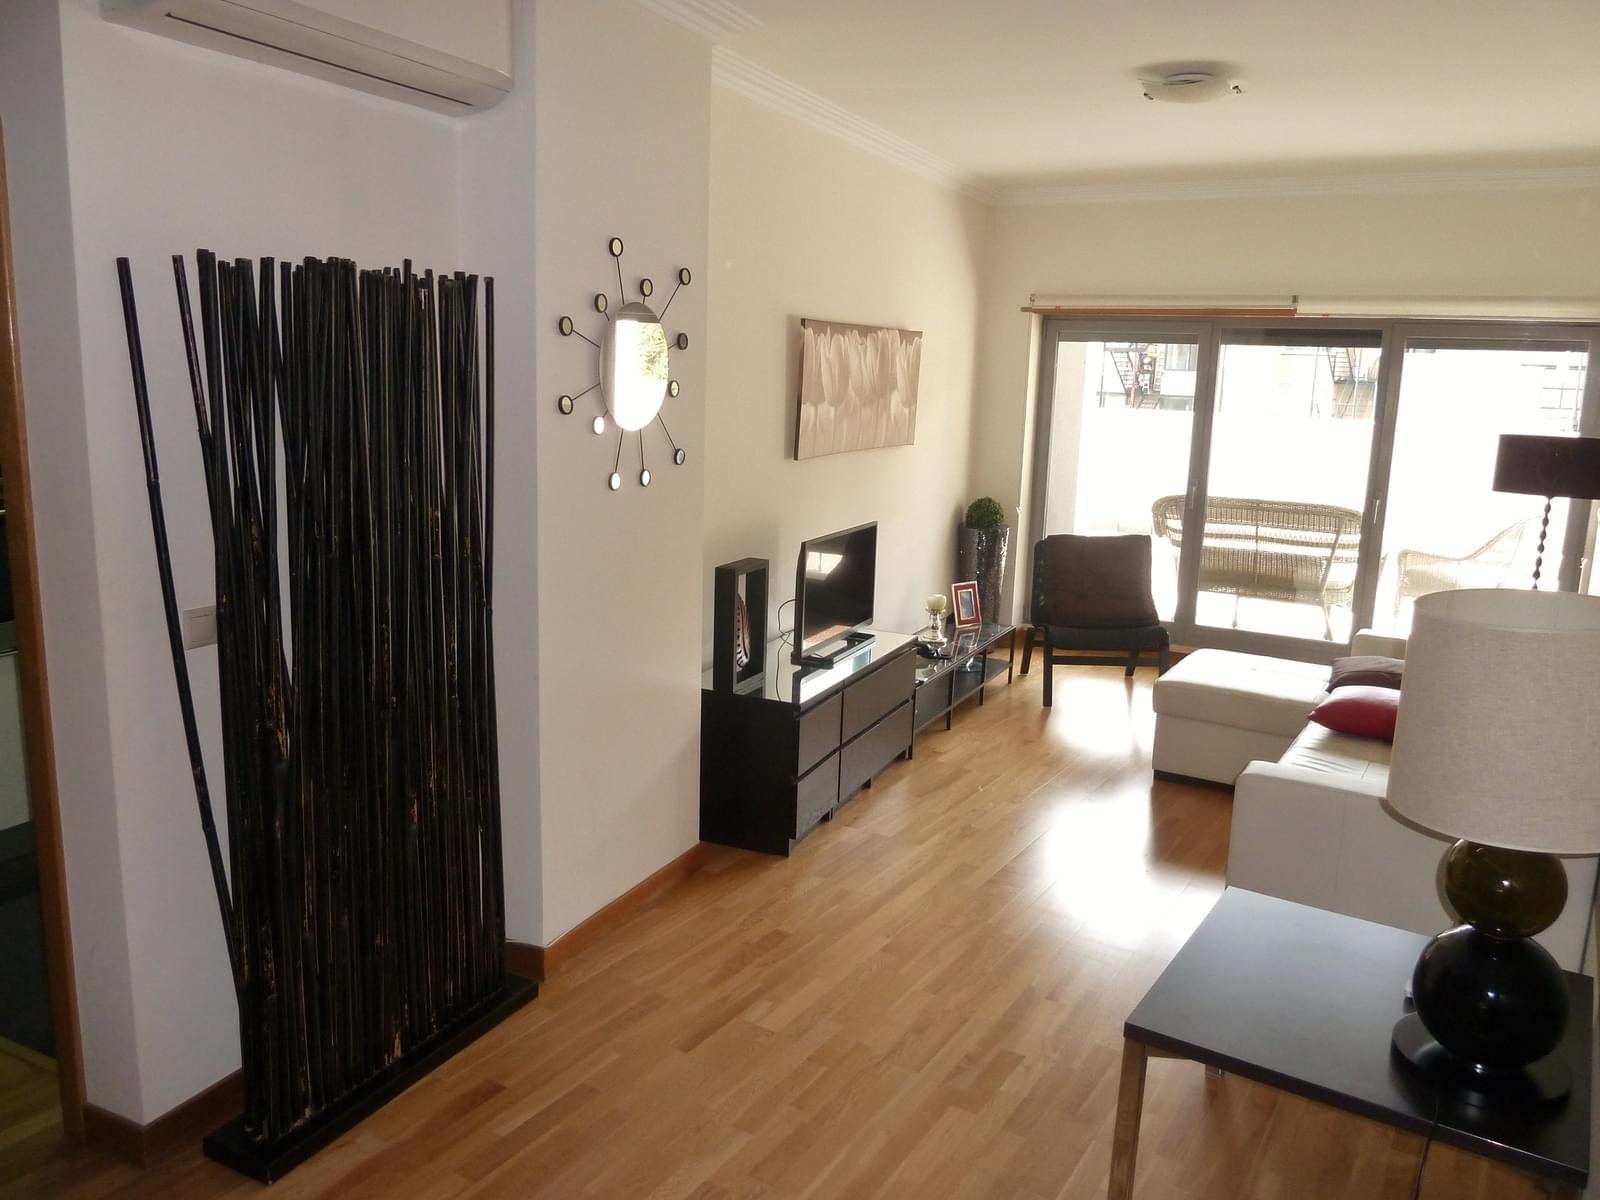 pf16882-apartamento-t2-lisboa-38a3e60b-bff1-4af1-a39f-ae9611294e2d